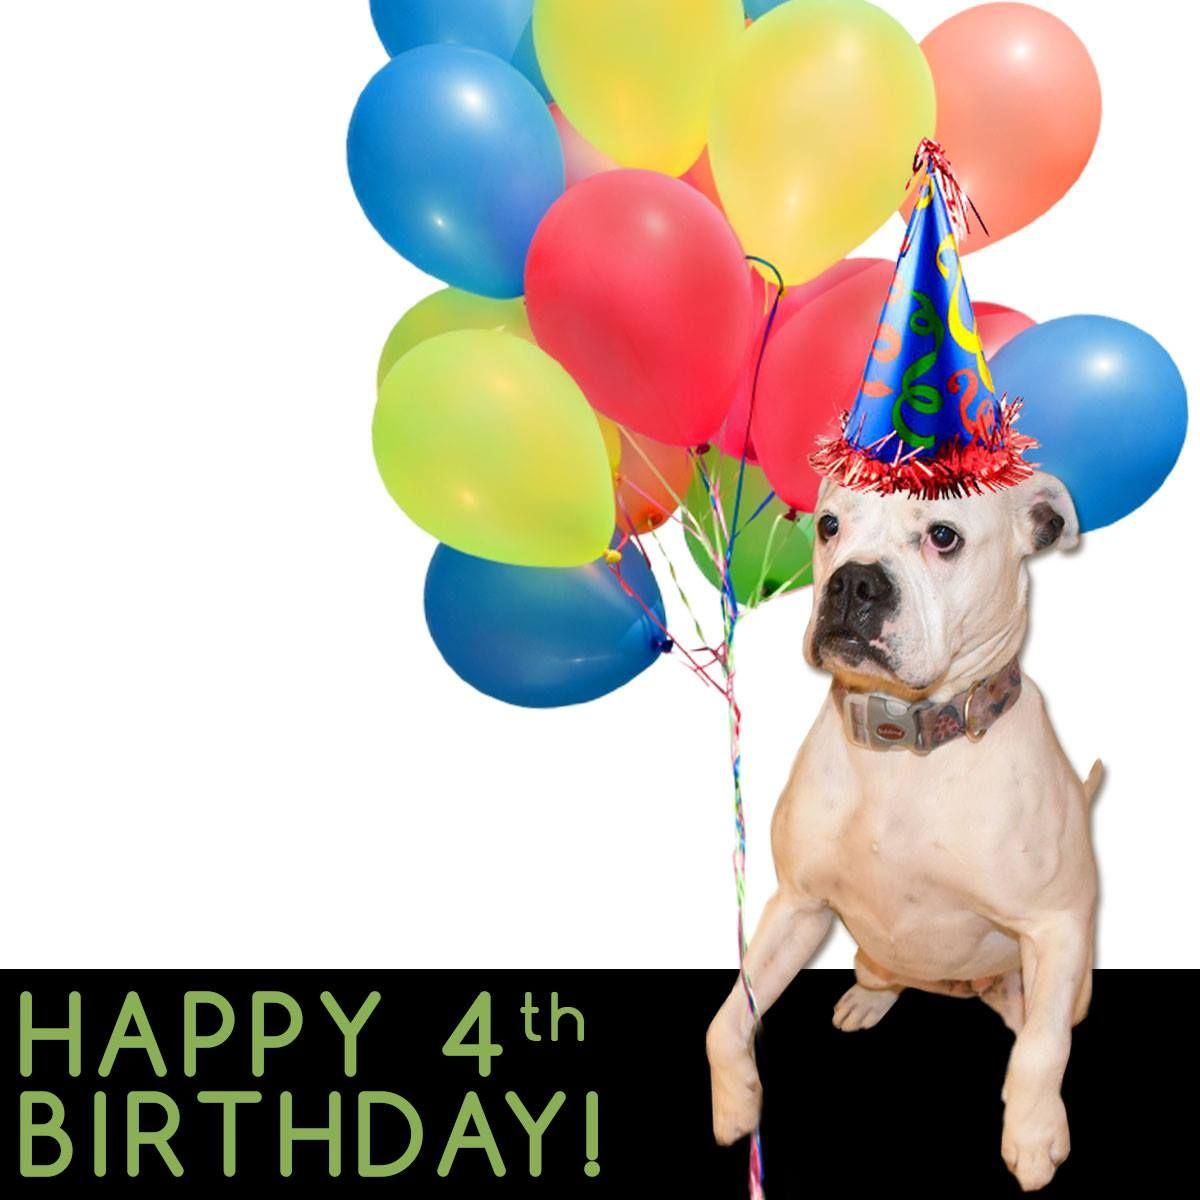 Our communications coordinator, Rosie, celebrates her 4th birthday on April 28, 2015! Happy birthday, Rosie!